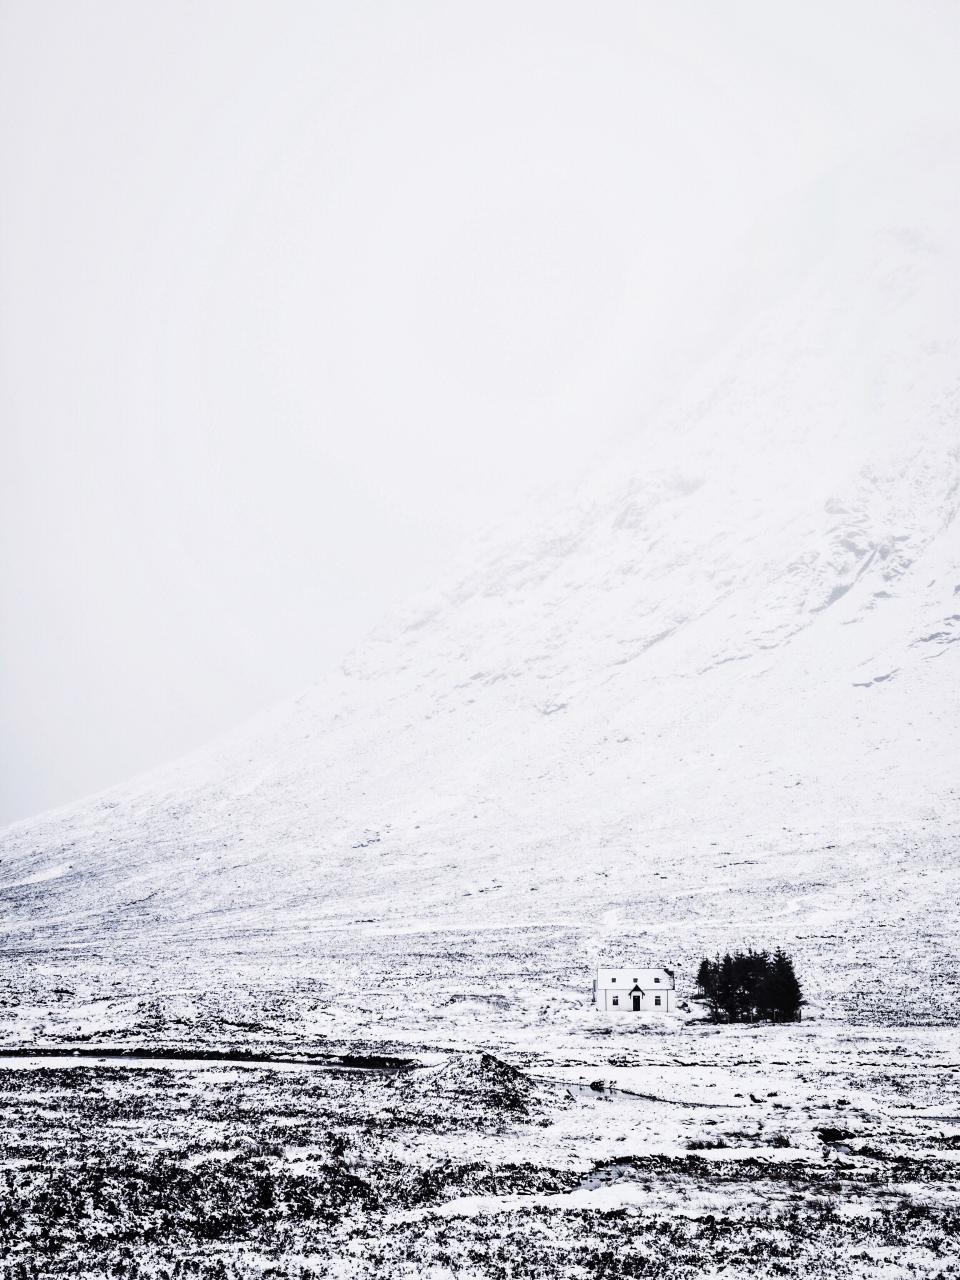 snow, winter, cold, landscape, nature, sky